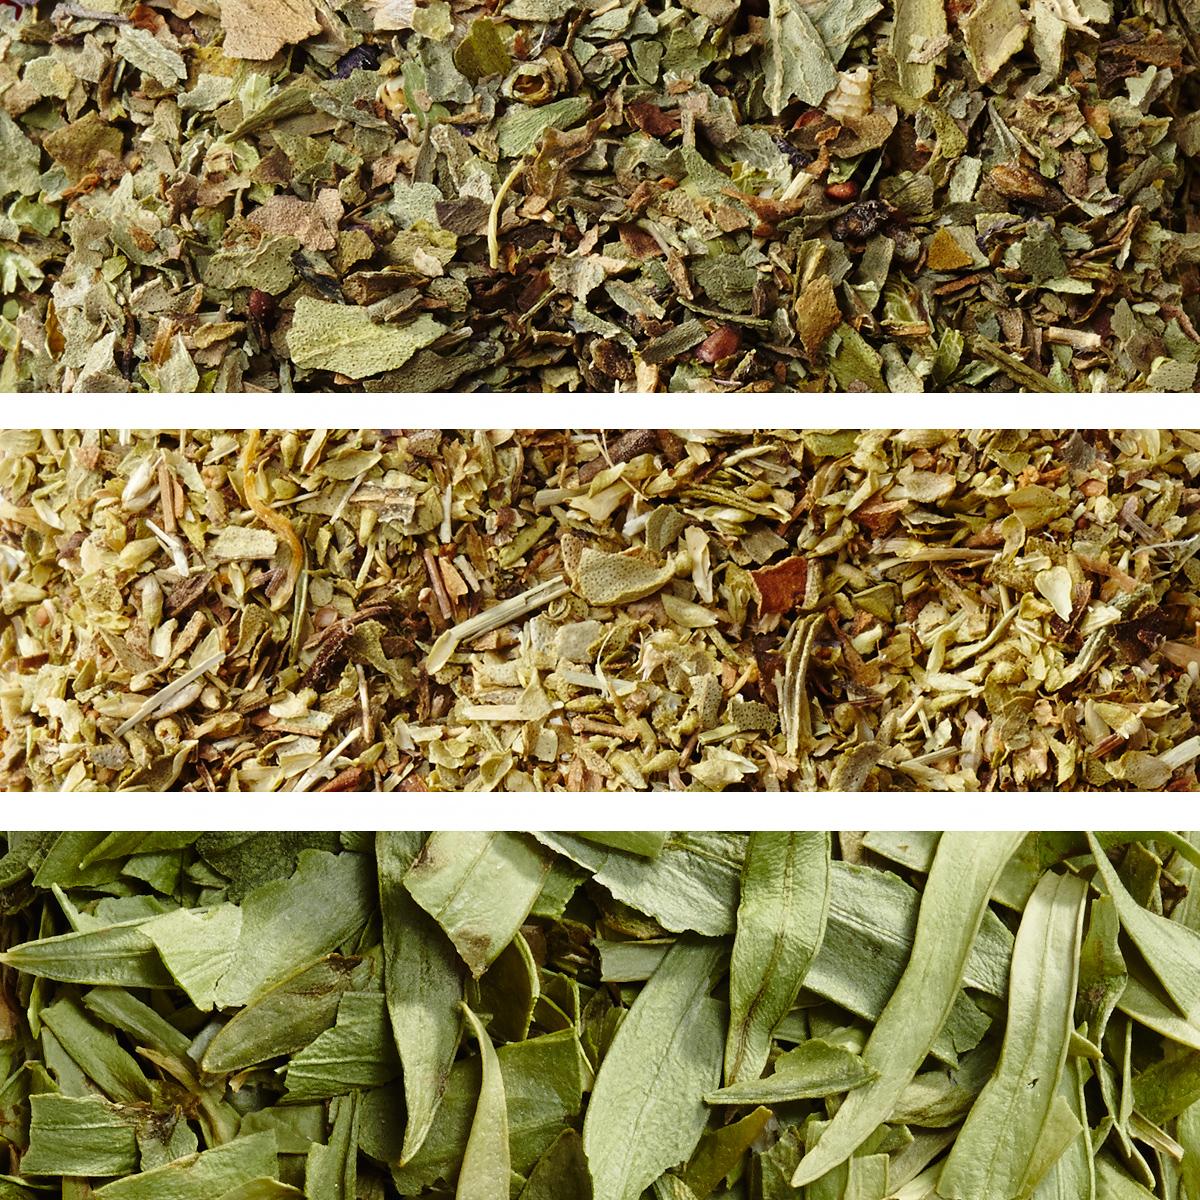 dried basil oregano and tarragon